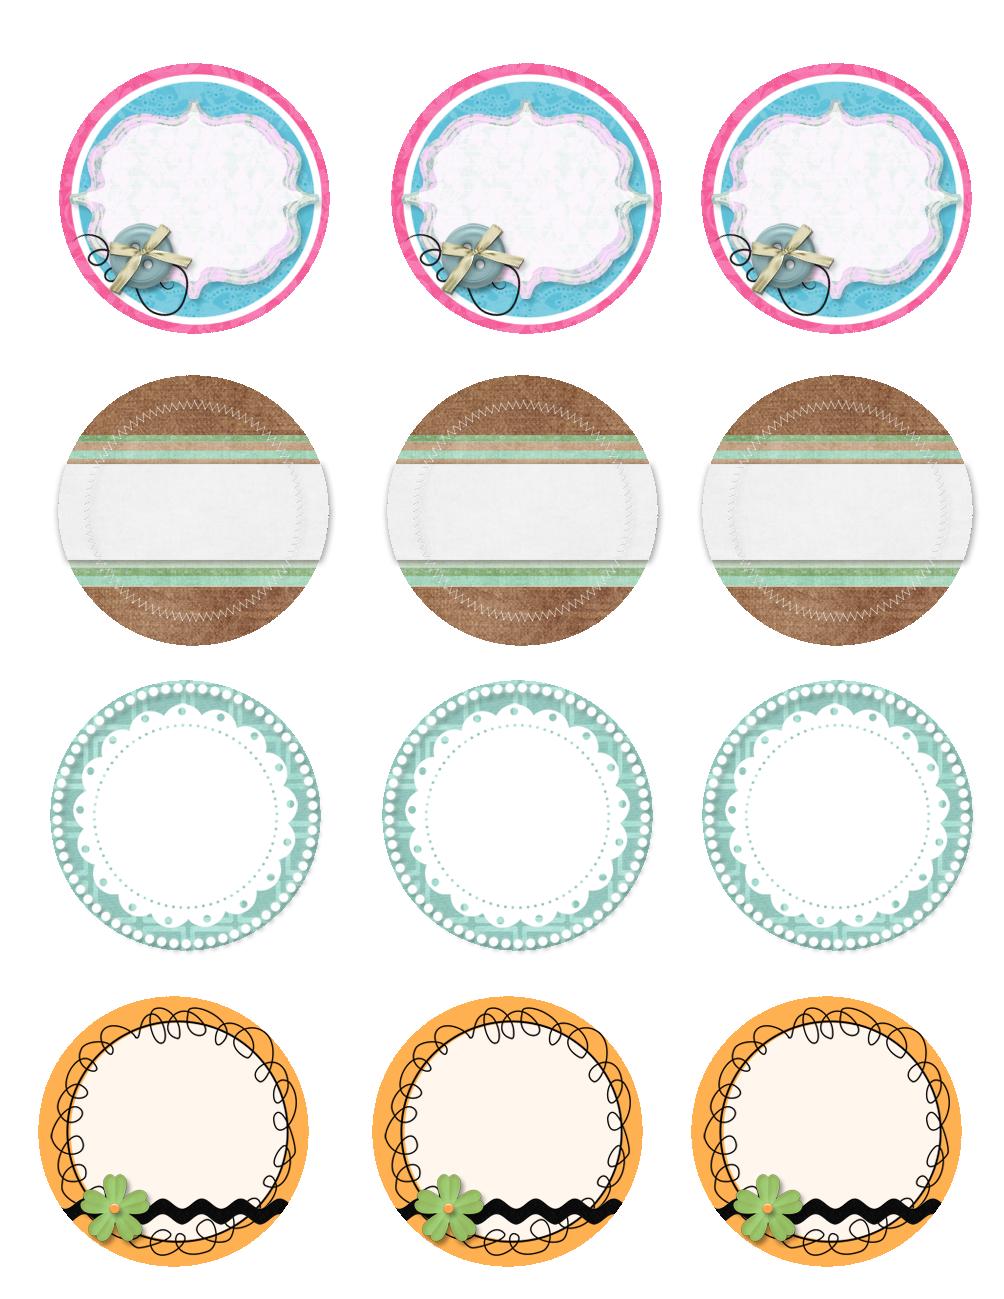 4 Images of Mason Jar Lid Labels Printable Free